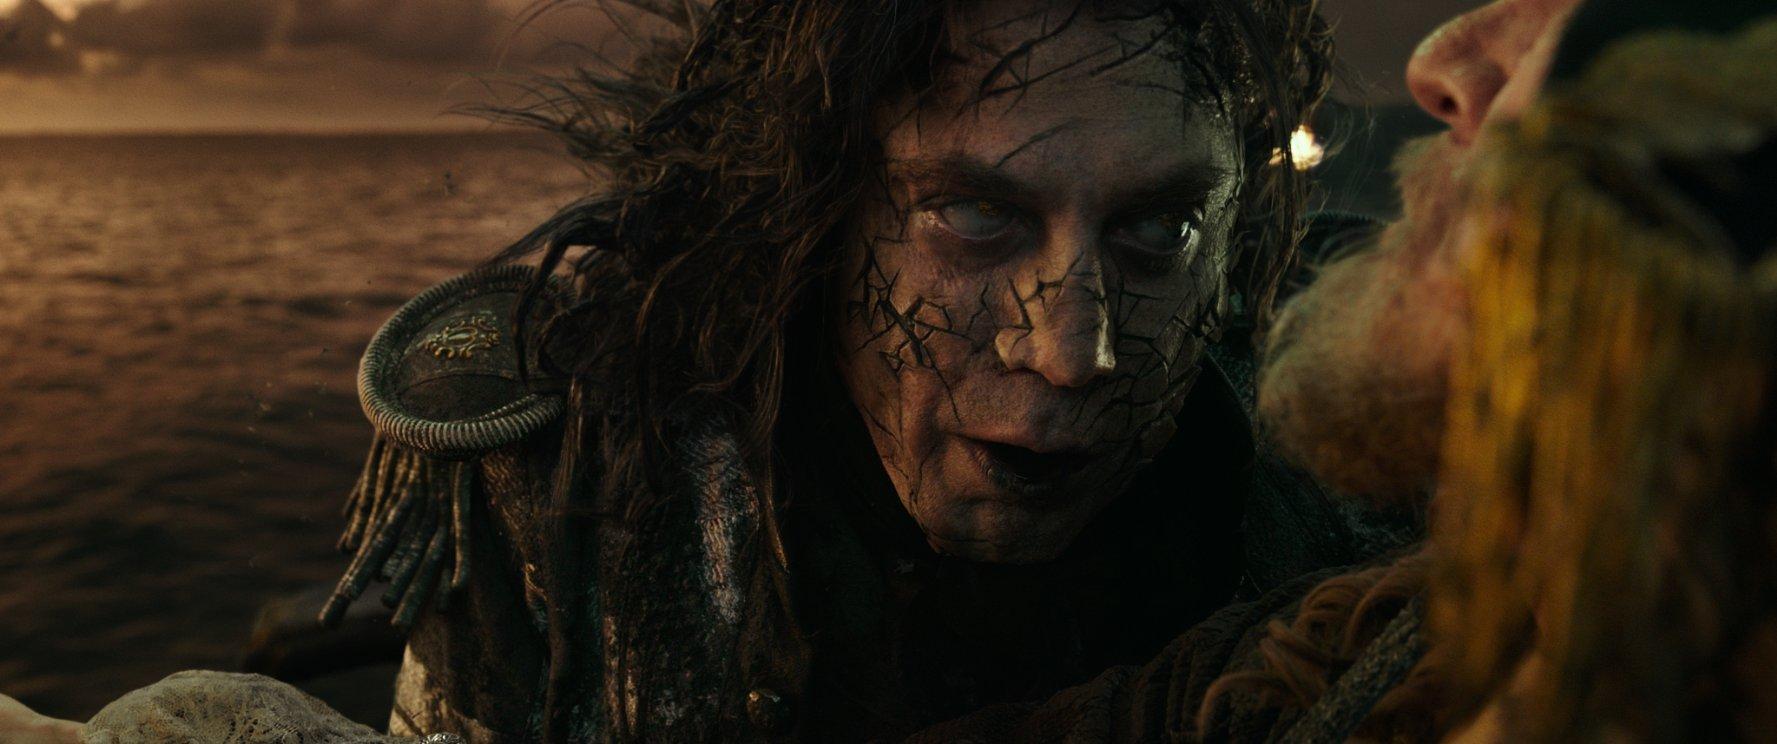 (2) film-piratite-od-karibite-odmazdata-na-salazar-pirates-of-the-caribbean-dead-men-tell-no-tales-www.kafepauza.mk